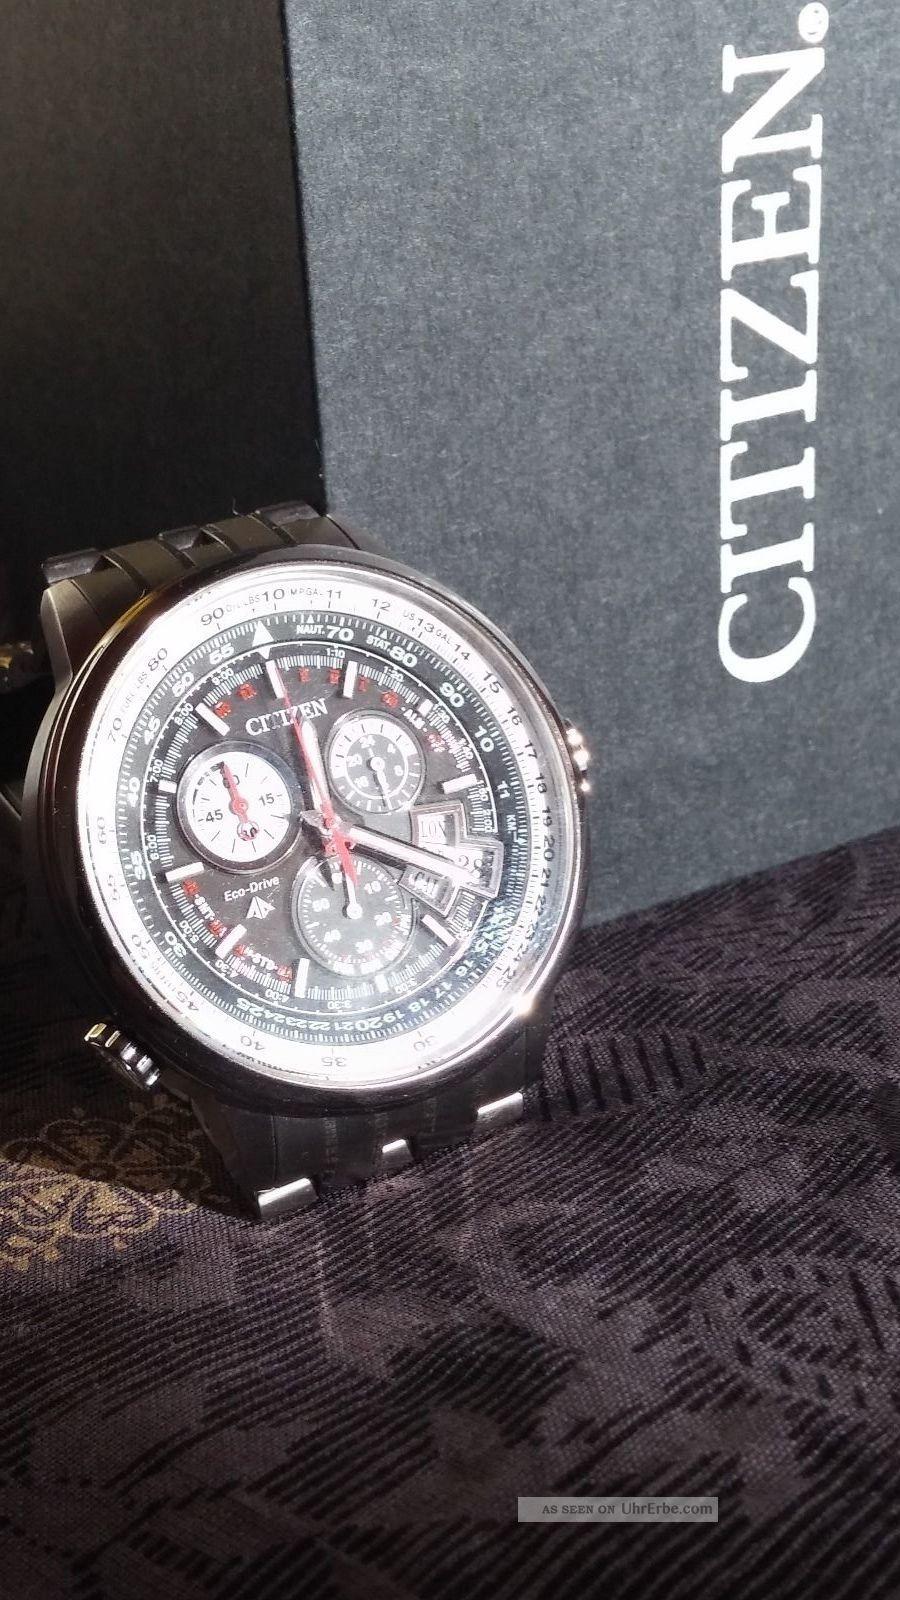 Citizen Herren - Armbanduhr Chronograph Quarz By0 / B8135 Radio - Contr.  Titanium Armbanduhren Bild